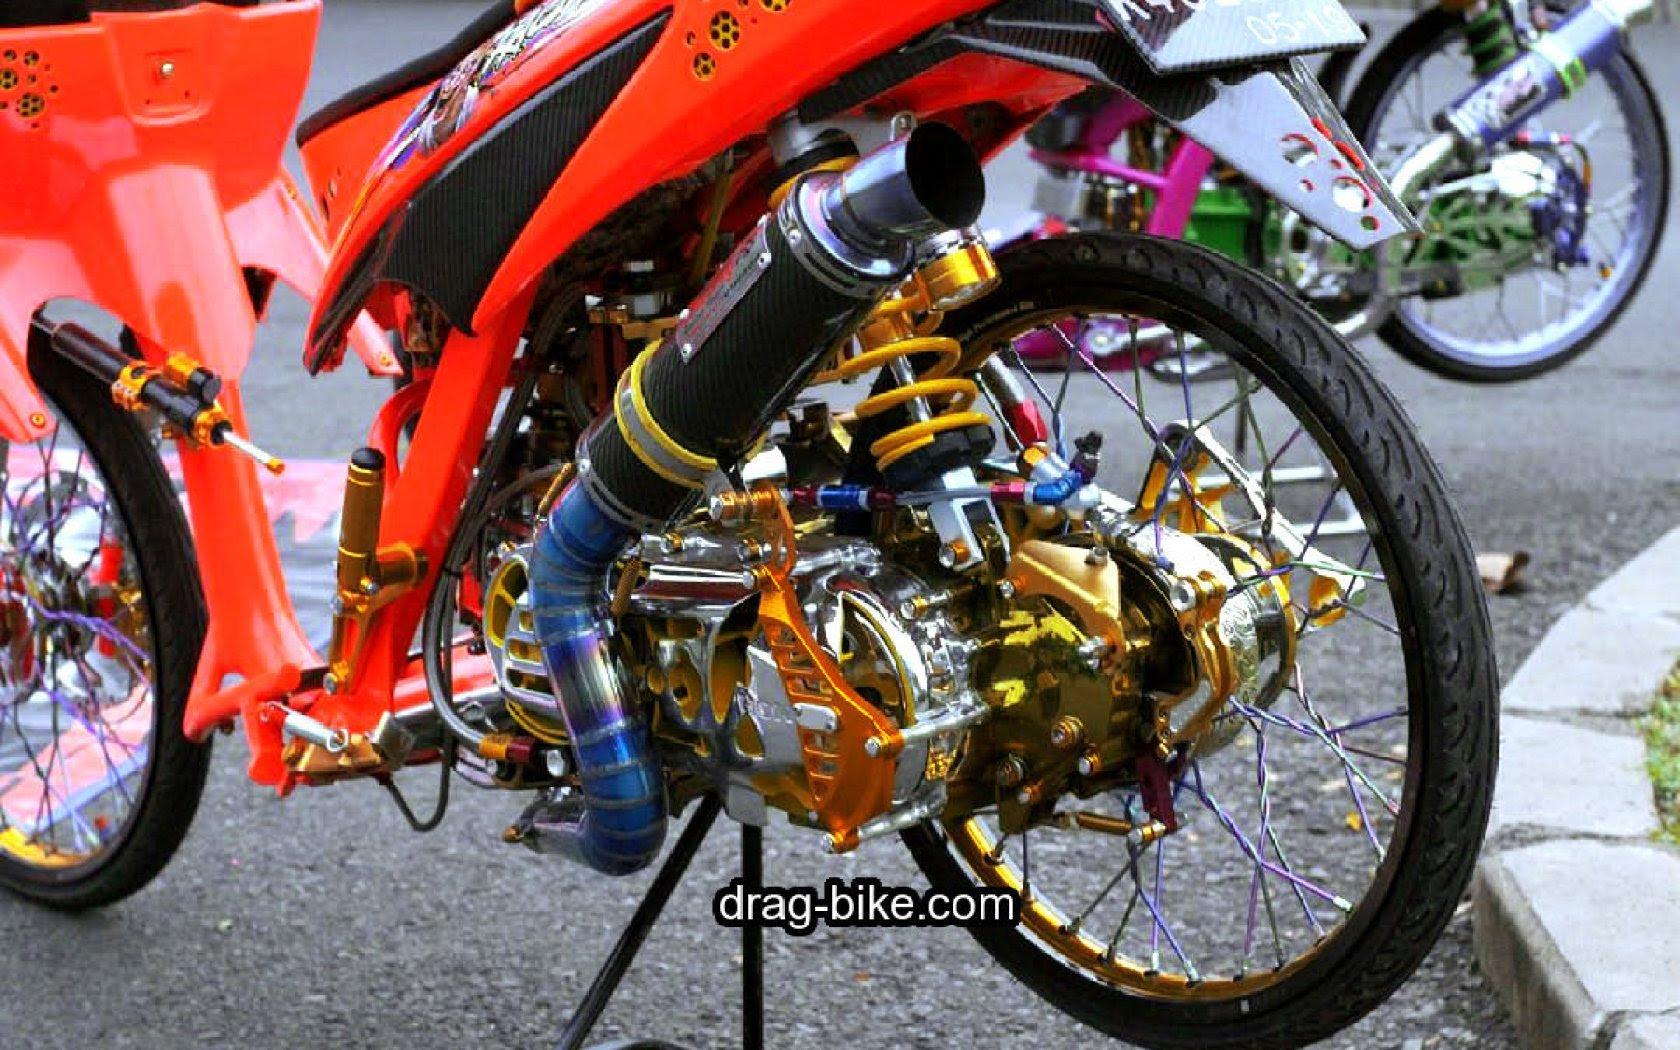 Koleksi 91 Gambar Motor Vario 110 Terupdate Nara Motor